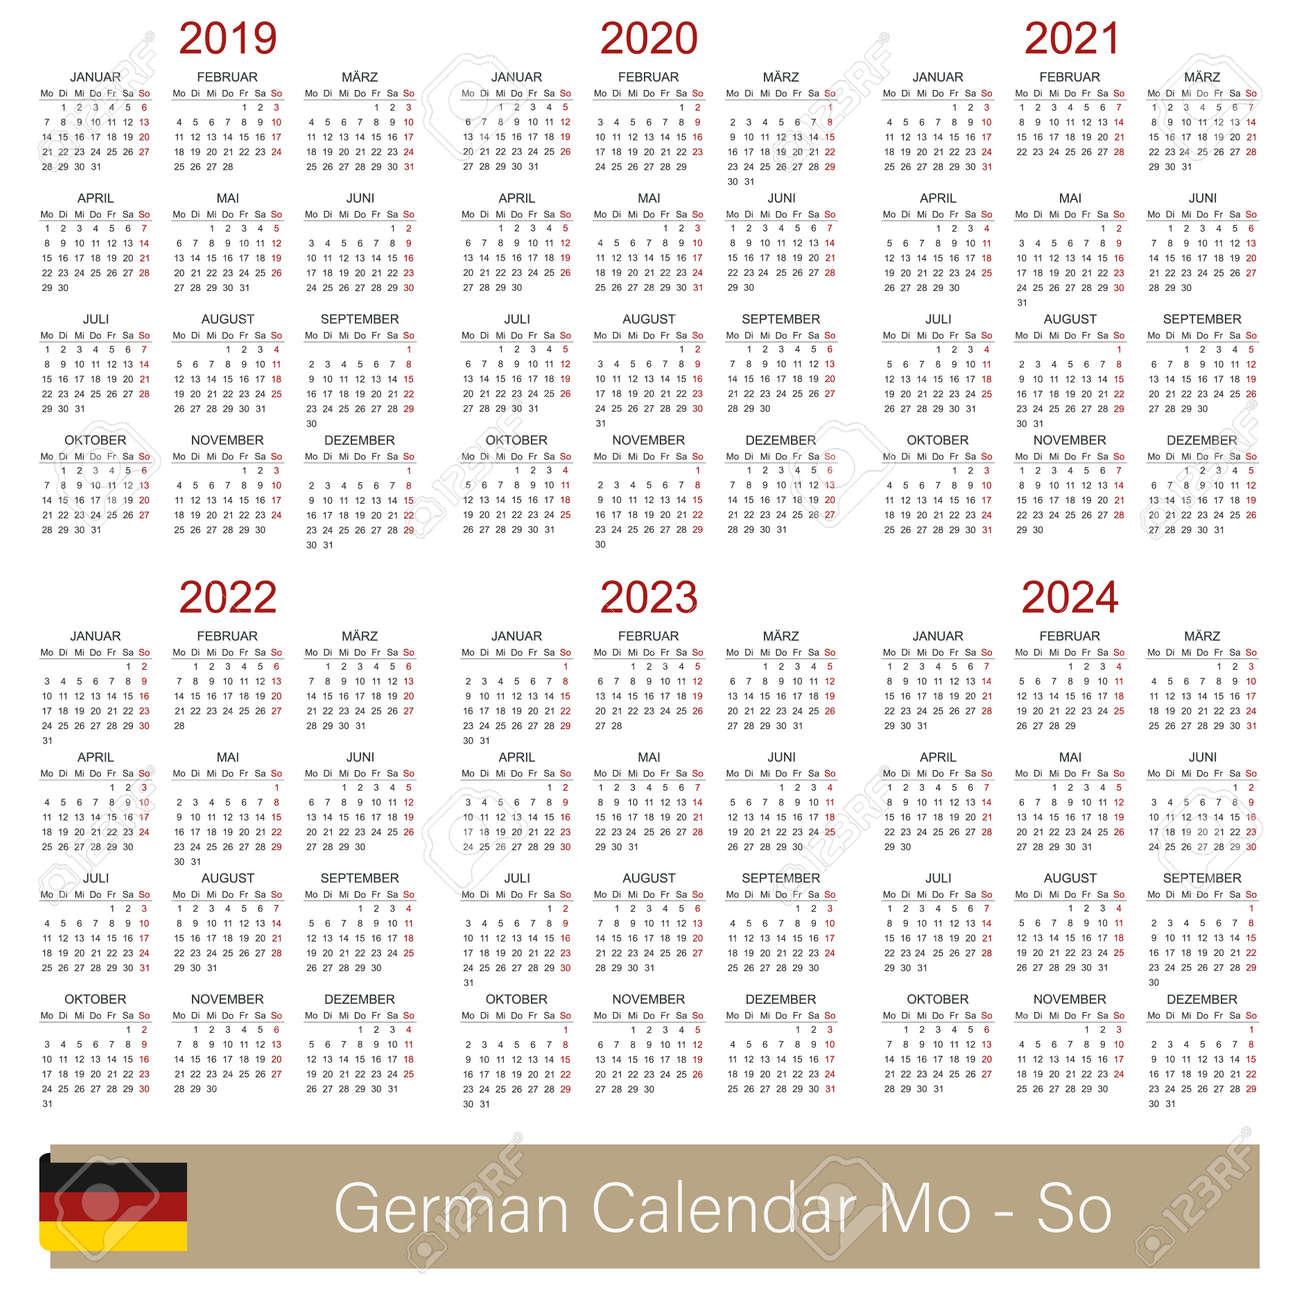 German calendar 2019 - 2024, week starts on Monday, simple calendar